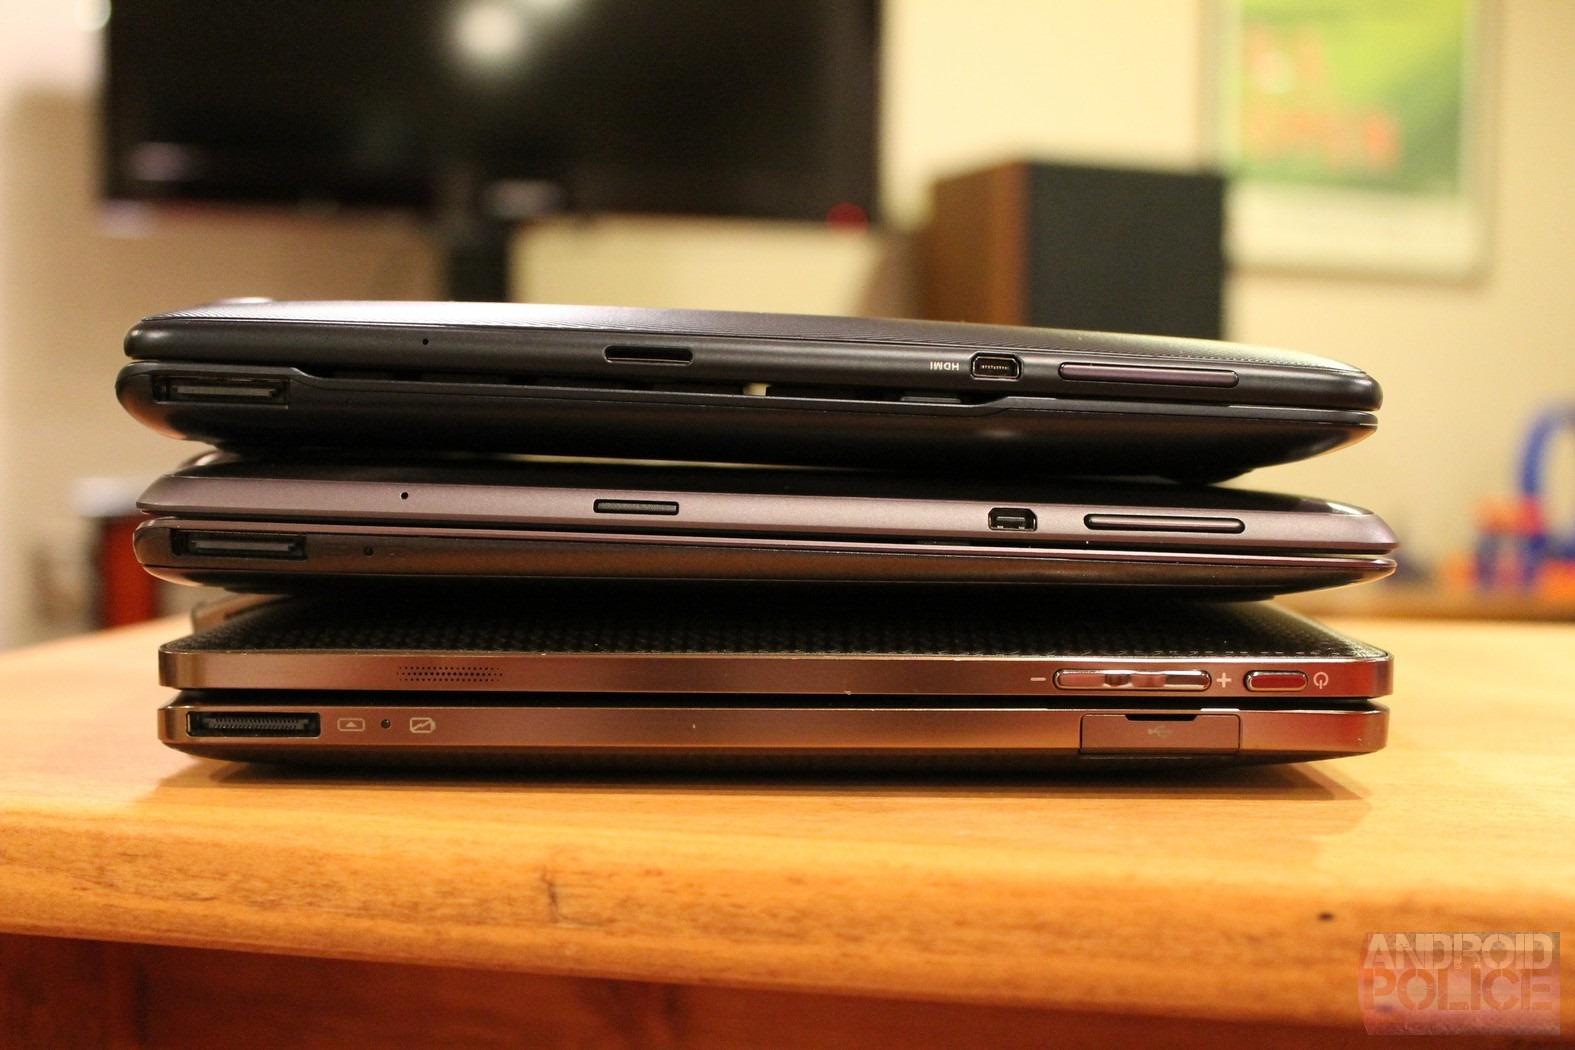 Asus Transformer Pad 300 Review: 85% Of The Premium Tablet